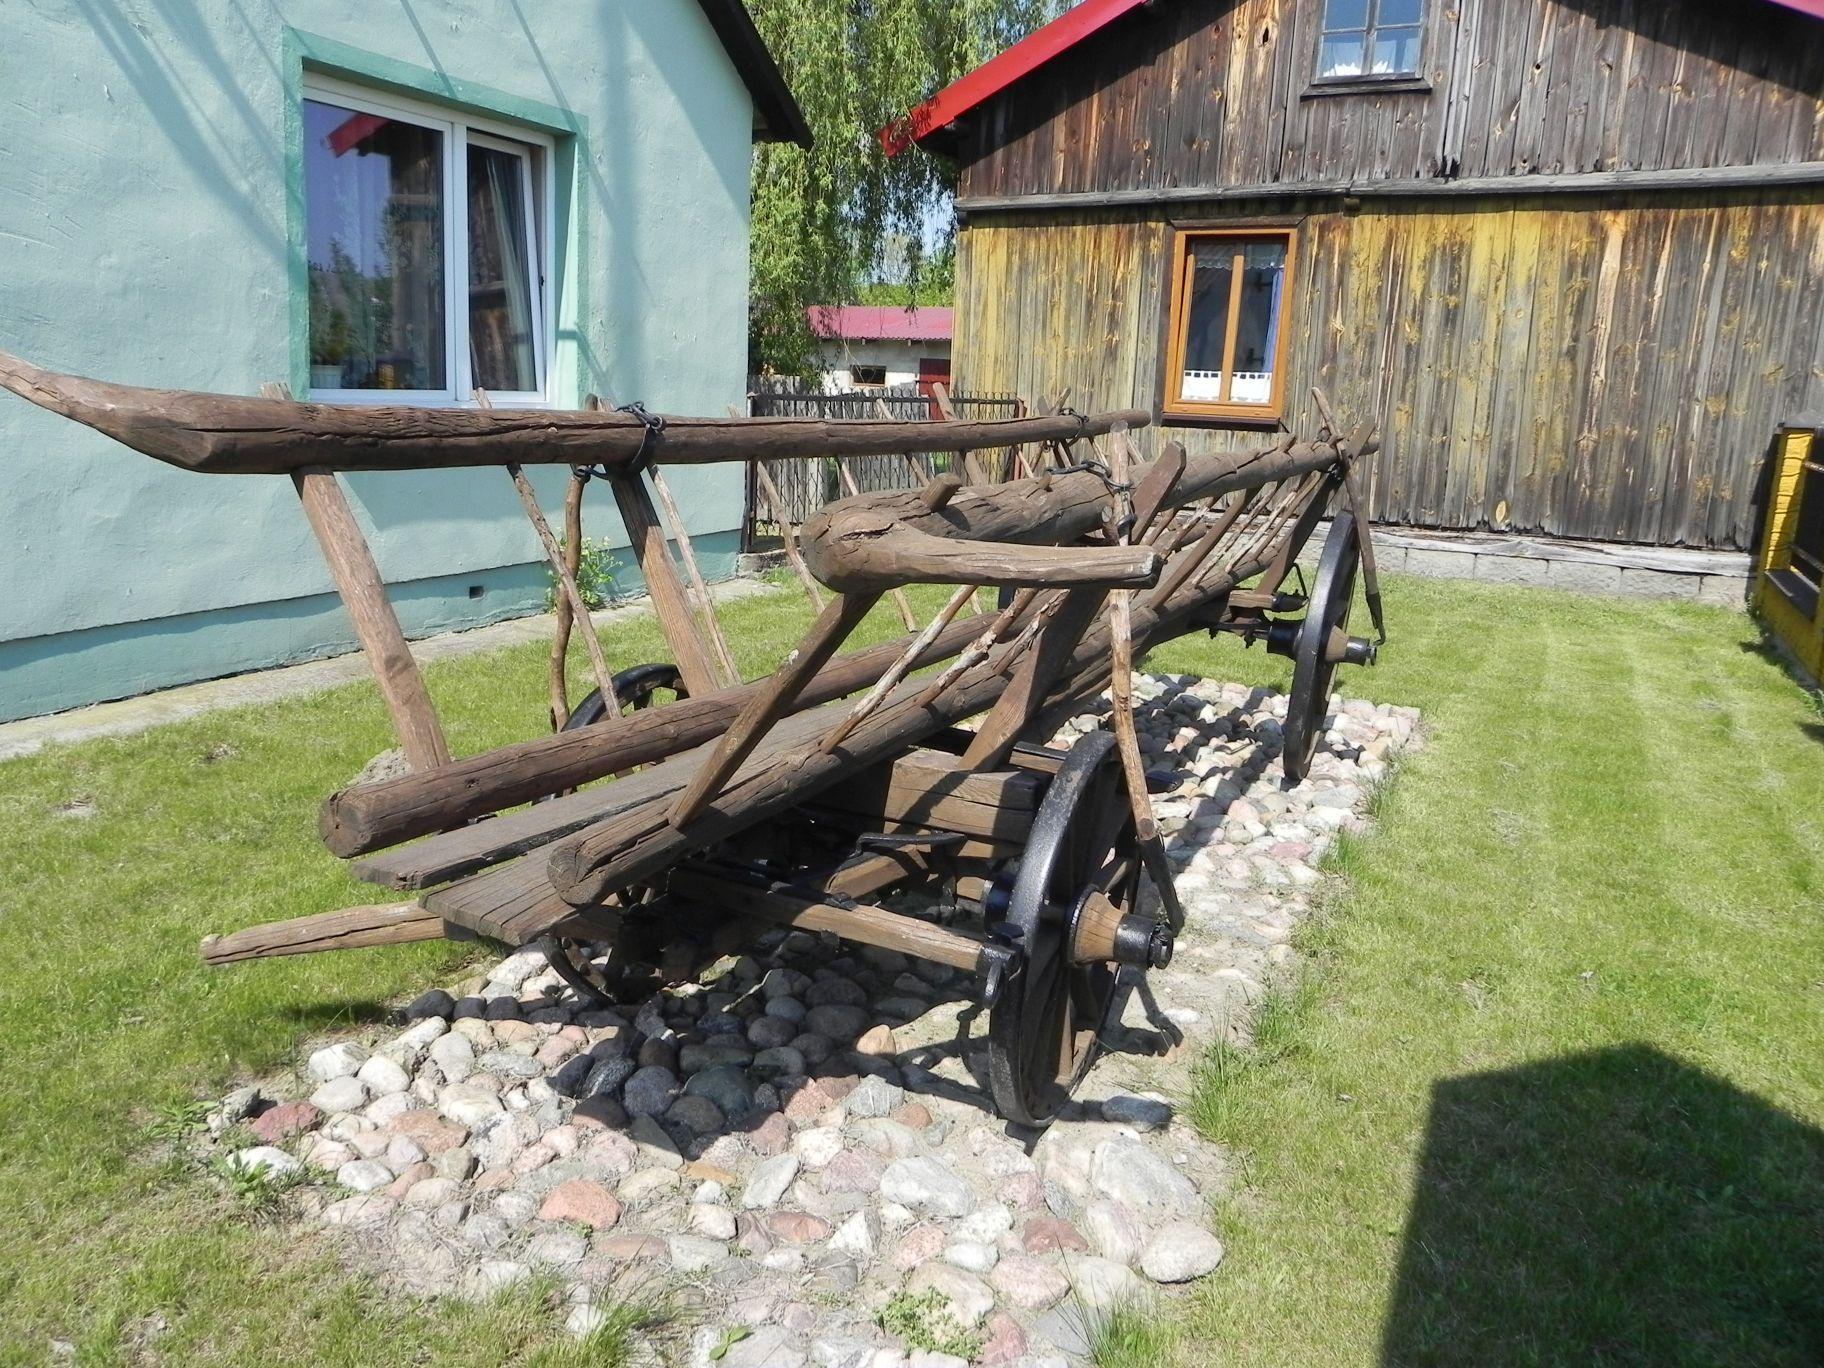 2012-05-03 Lipce Reymontowskie - galeria staroci (92)